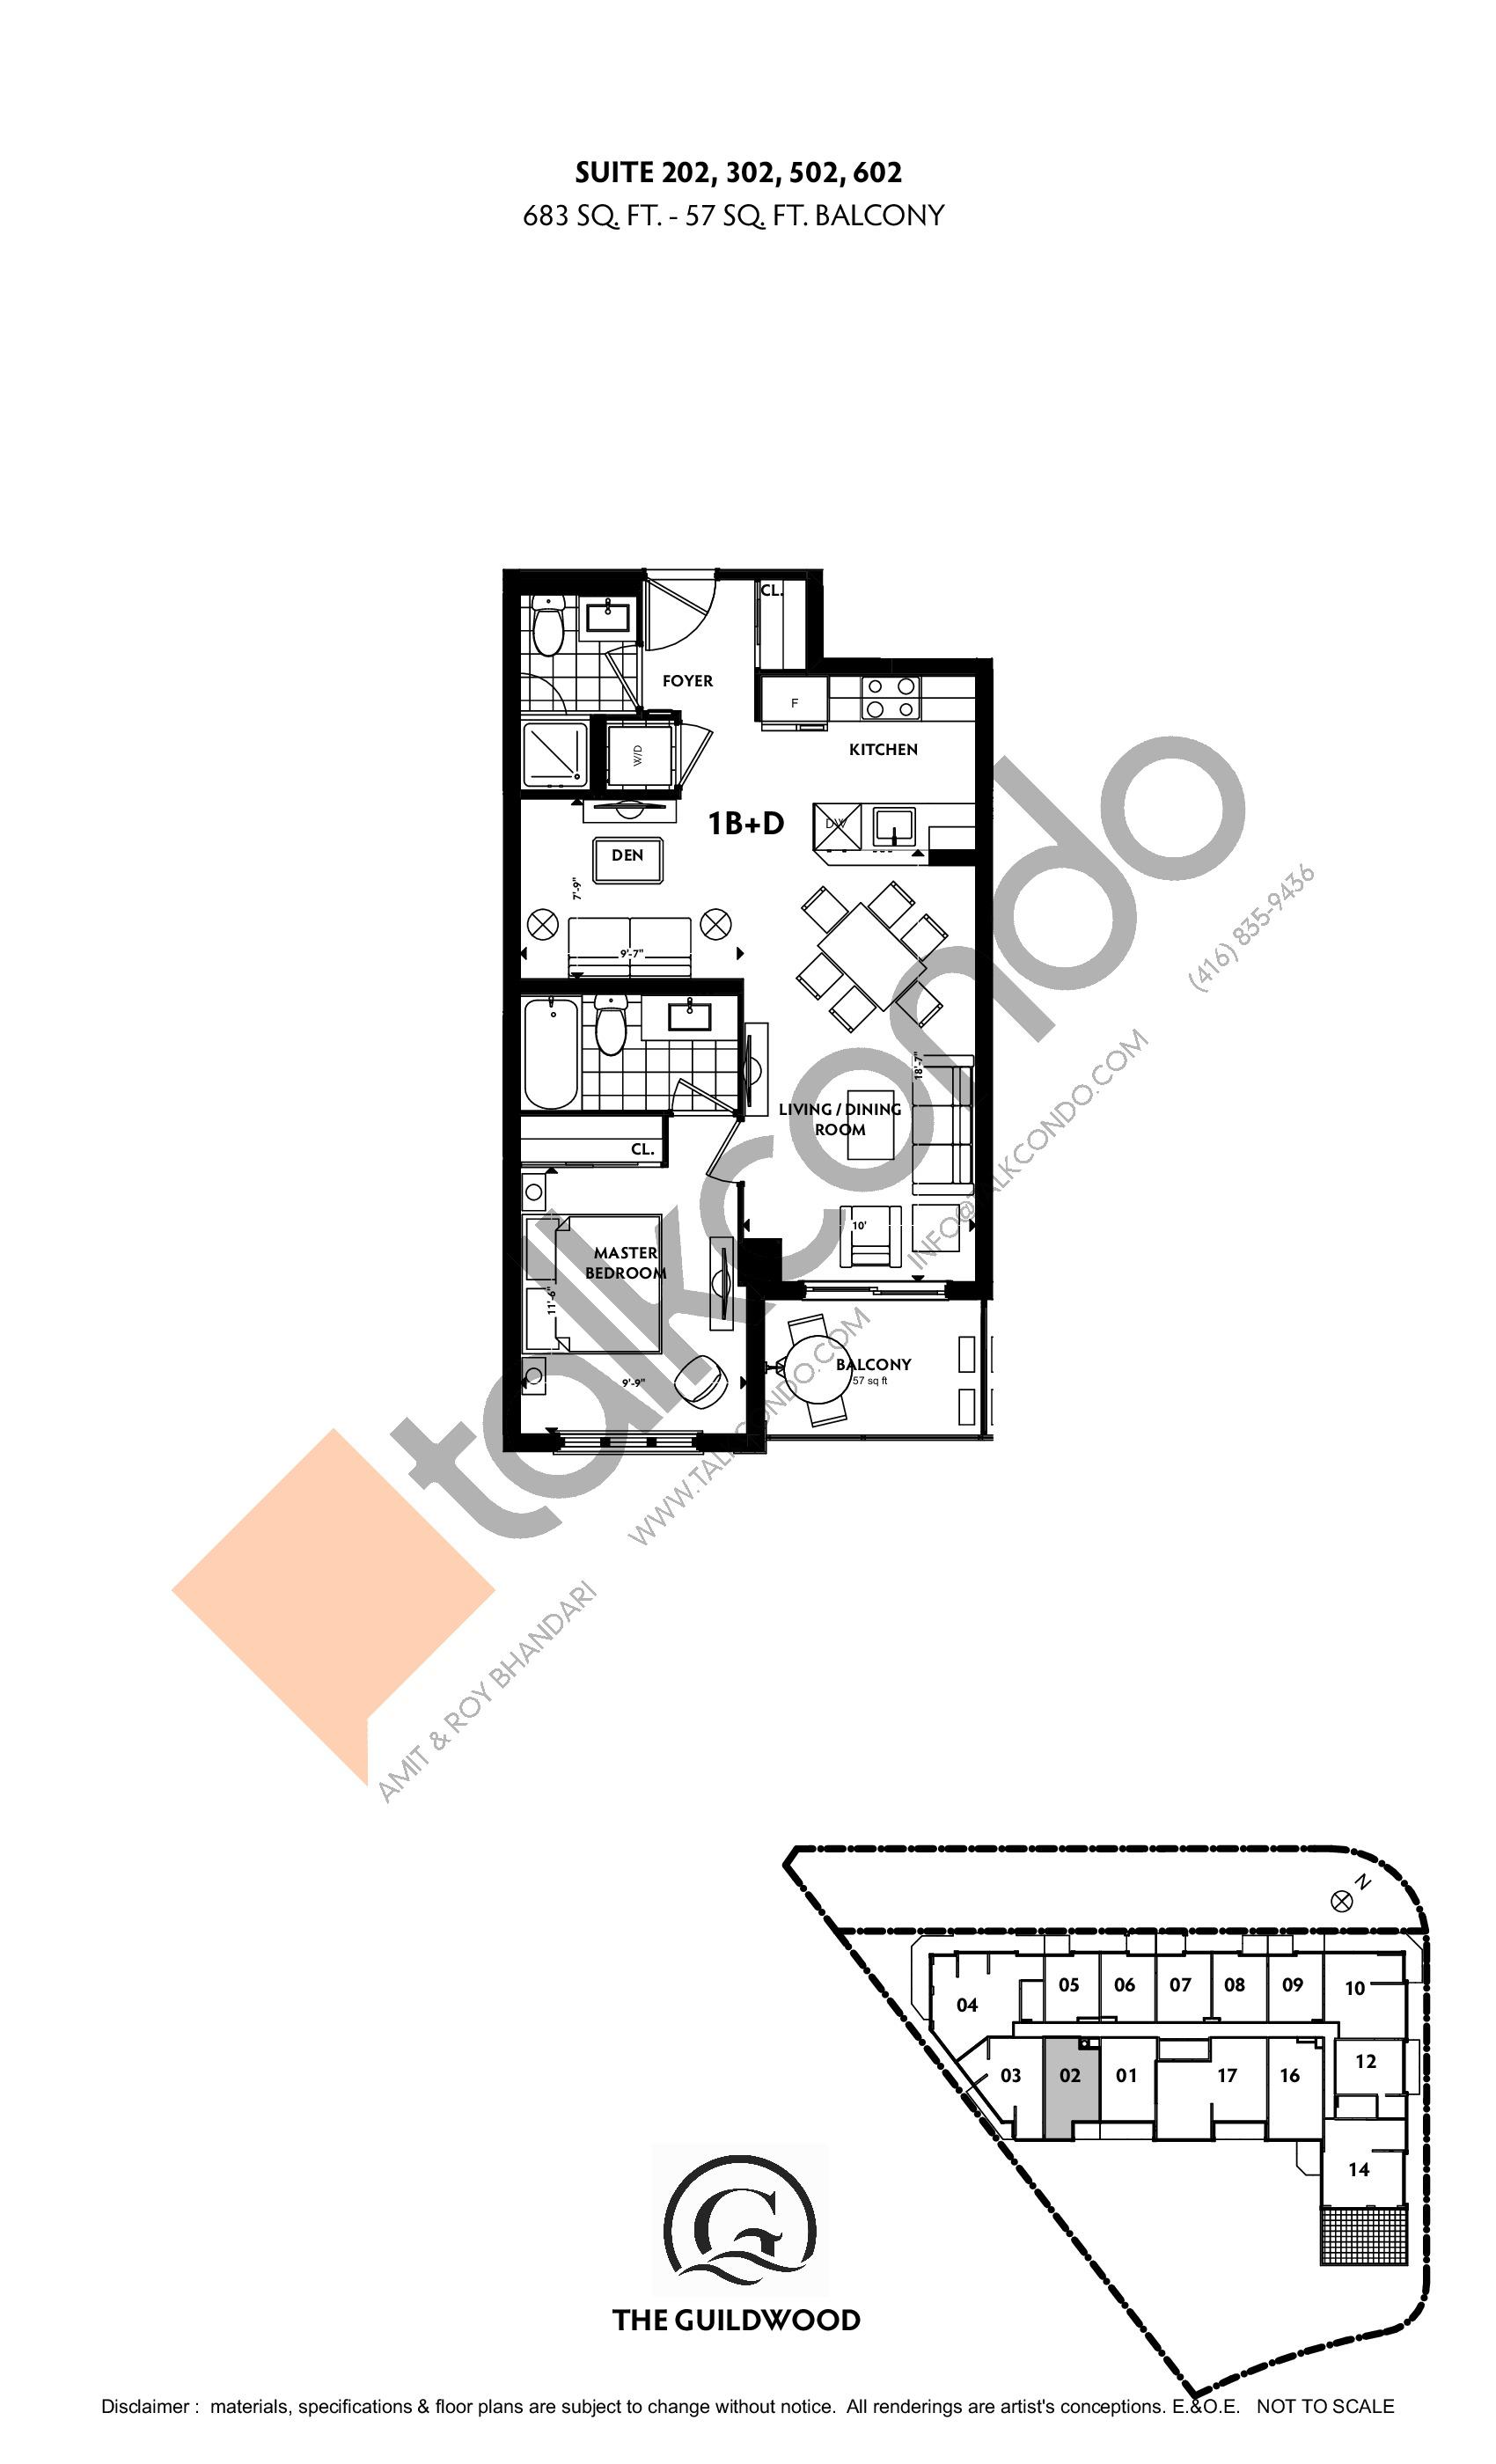 Suite 202, 302, 502, 602 Floor Plan at Guildwood Condos - 683 sq.ft